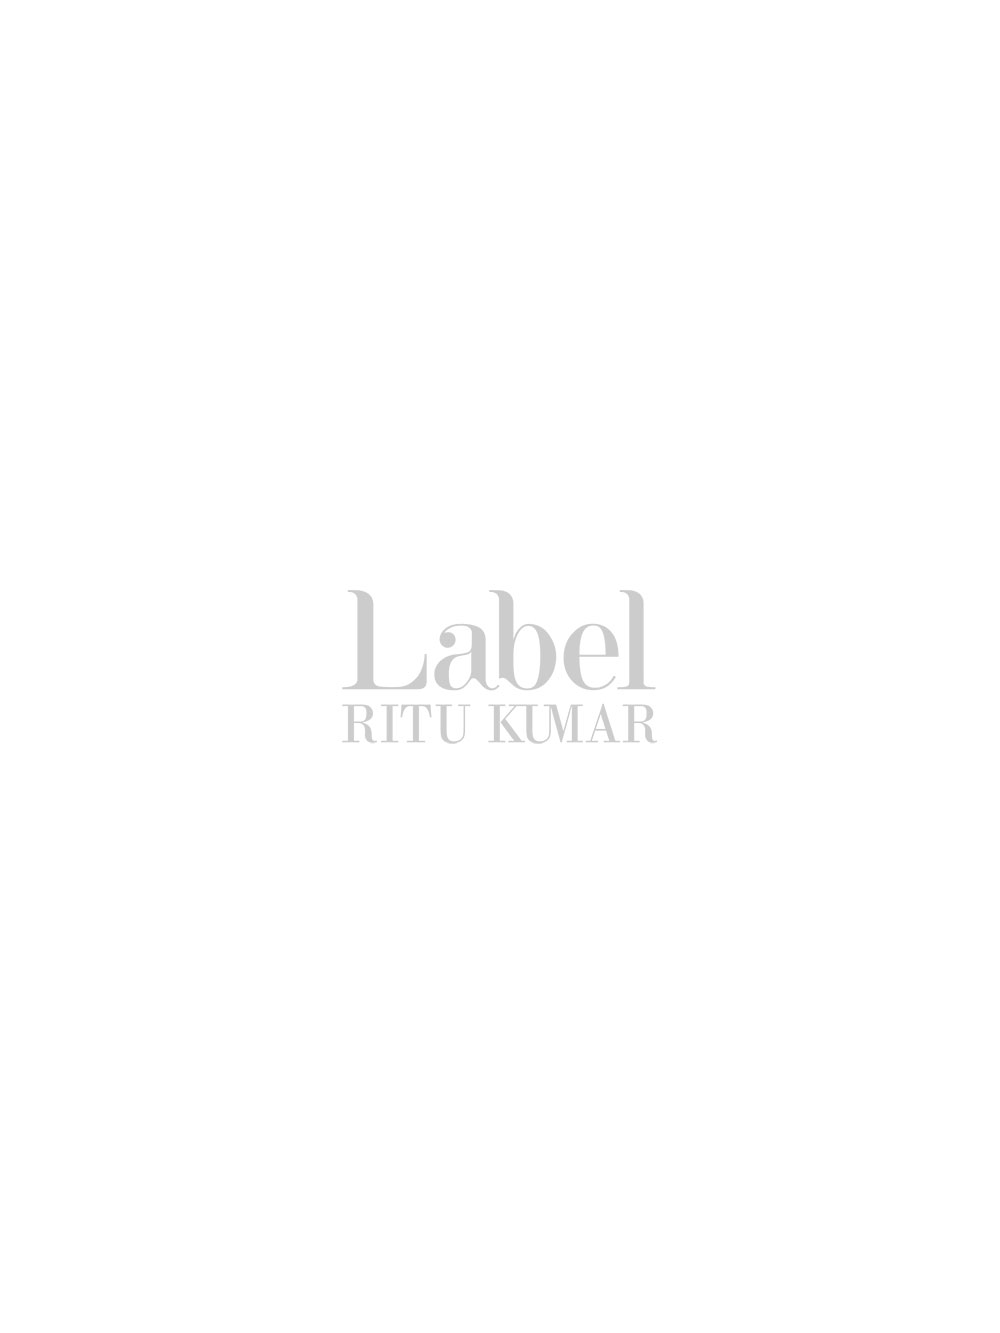 Turquoise Shirt Dress by label ritu kumar